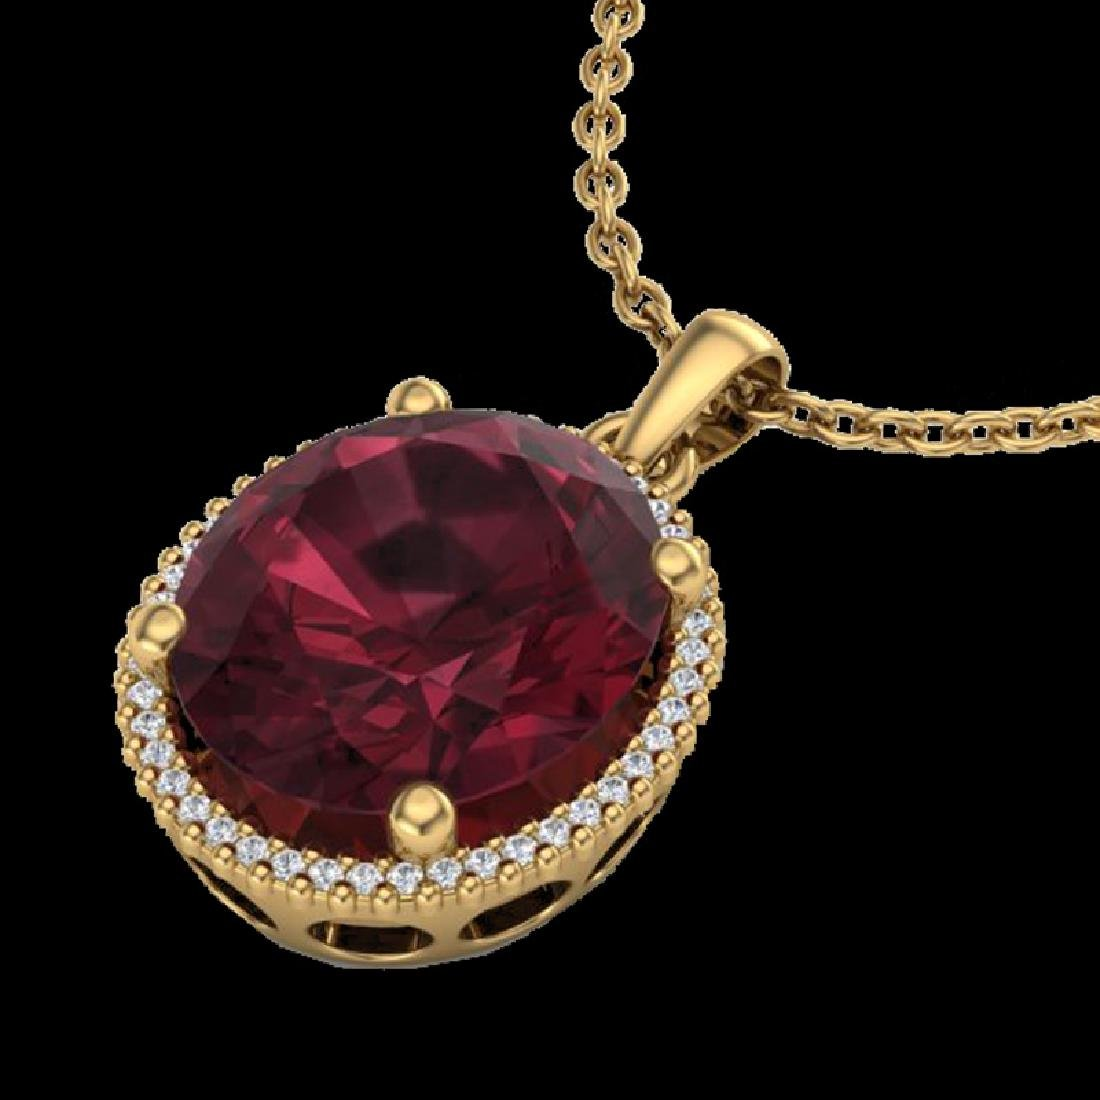 11 CTW Garnet & Micro Pave VS/SI Diamond Halo Necklace - 2